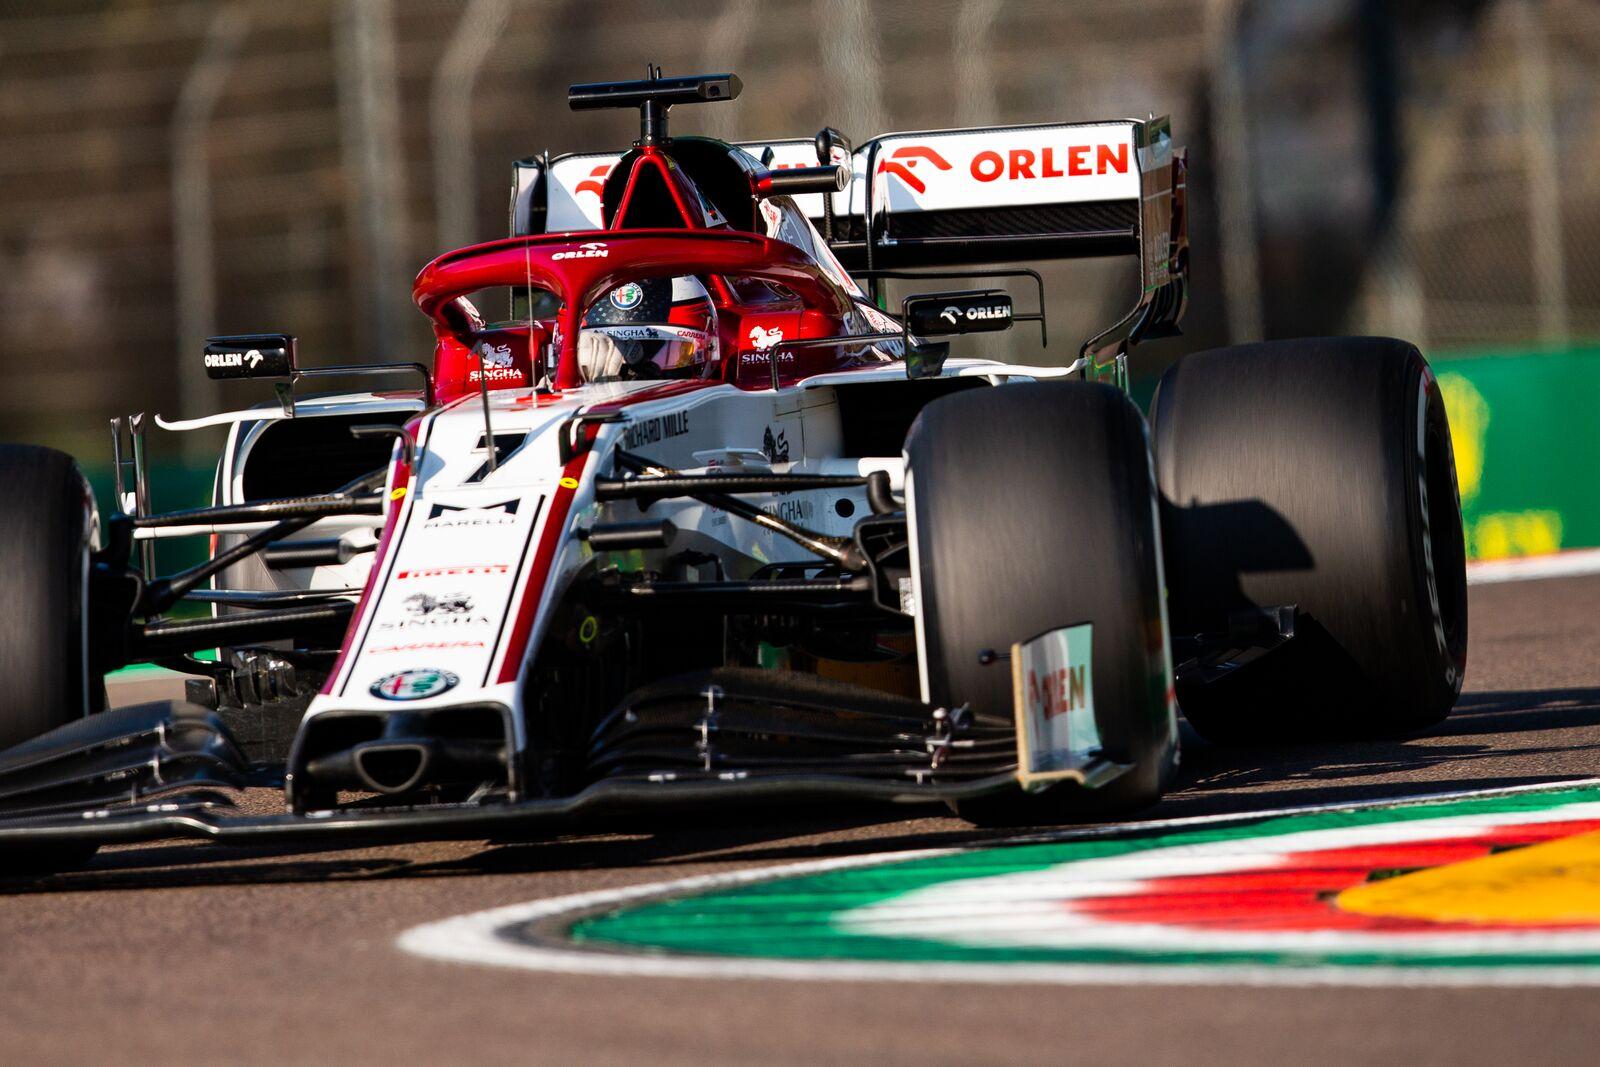 20202BEmilia2BRomagna2BGrand2BPrix2B 2BSaturday12B2528322529 1 Στρέφει τη προσοχή της στο Emilia Romagna Grand Prix, η Alfa Romeo Racing ORLEN